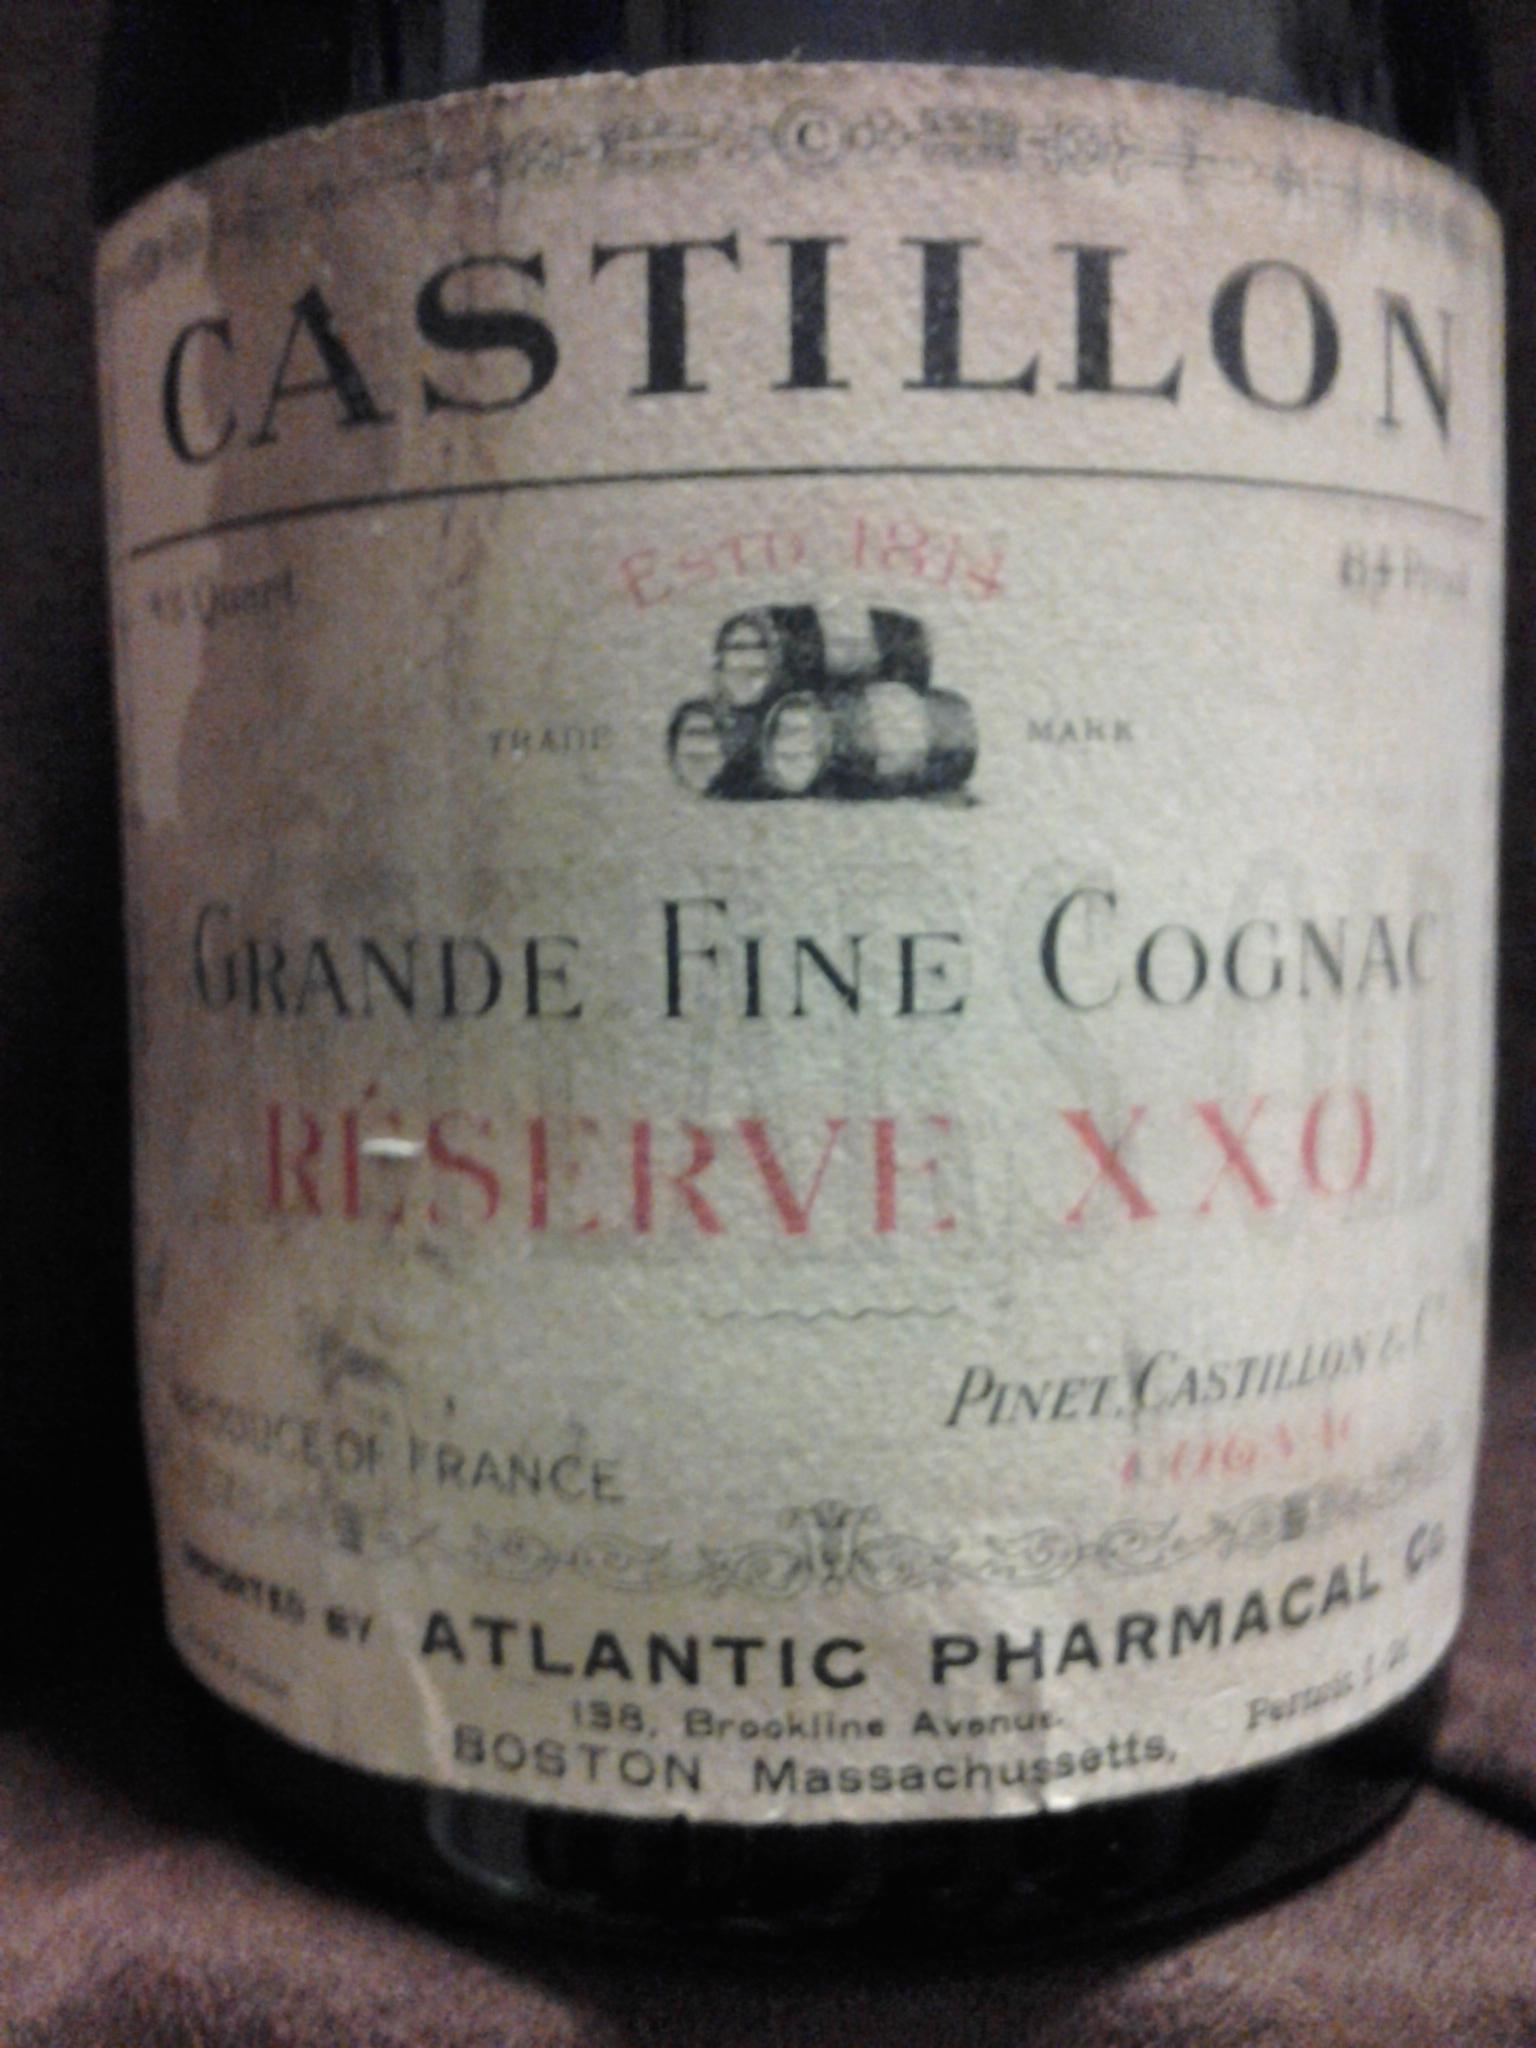 A Reader owns a Pinet Castillon Grande Fine Cognac Reserve XXO